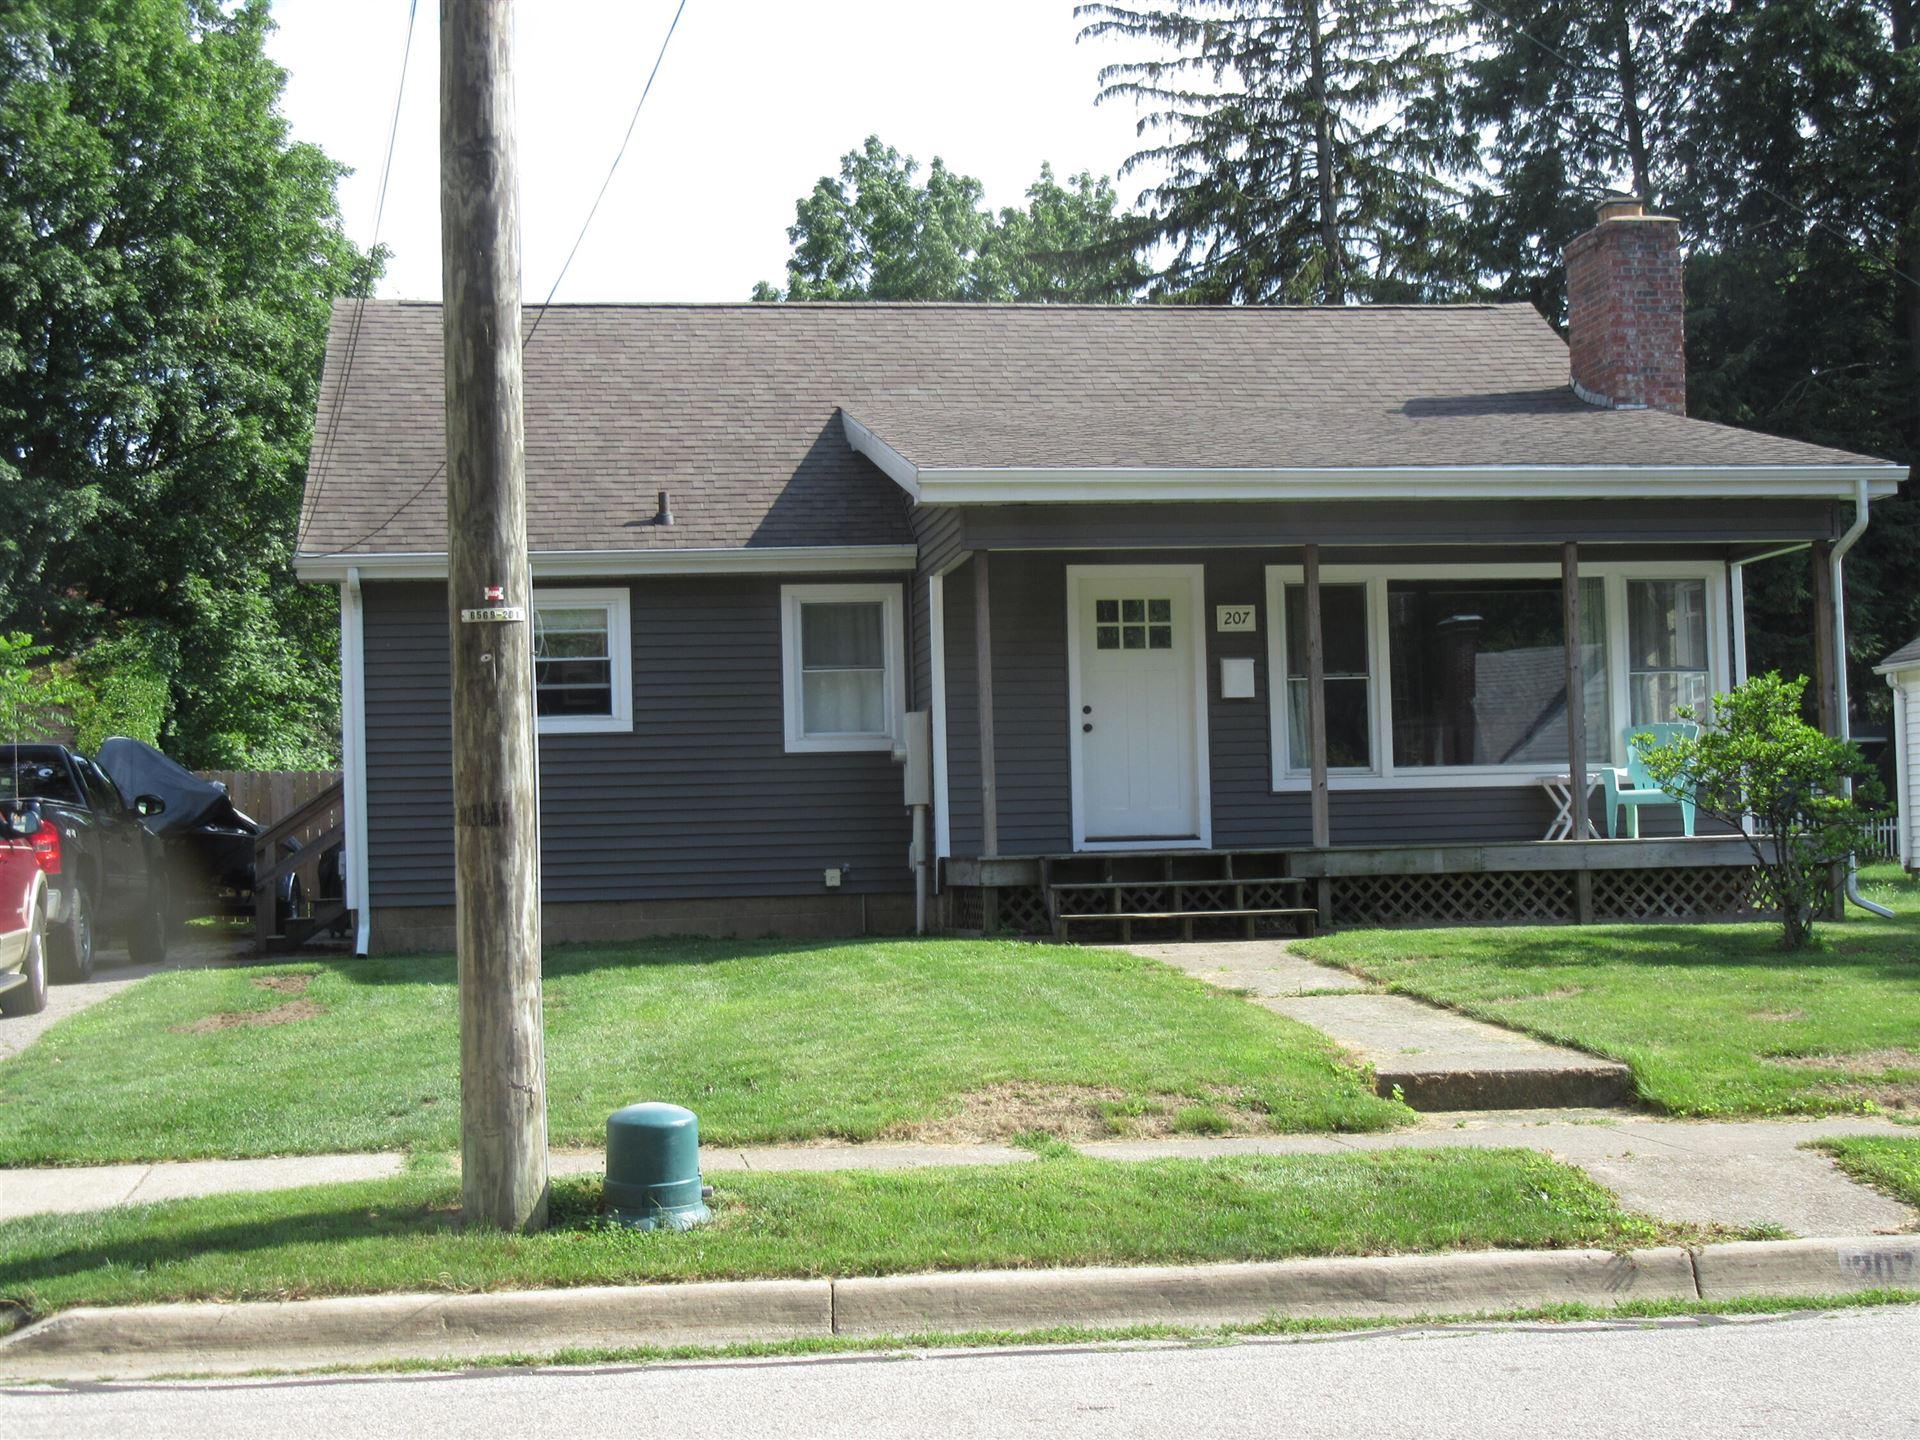 207 W 3rd Street, Buchanan, MI 49107 - MLS#: 21027238